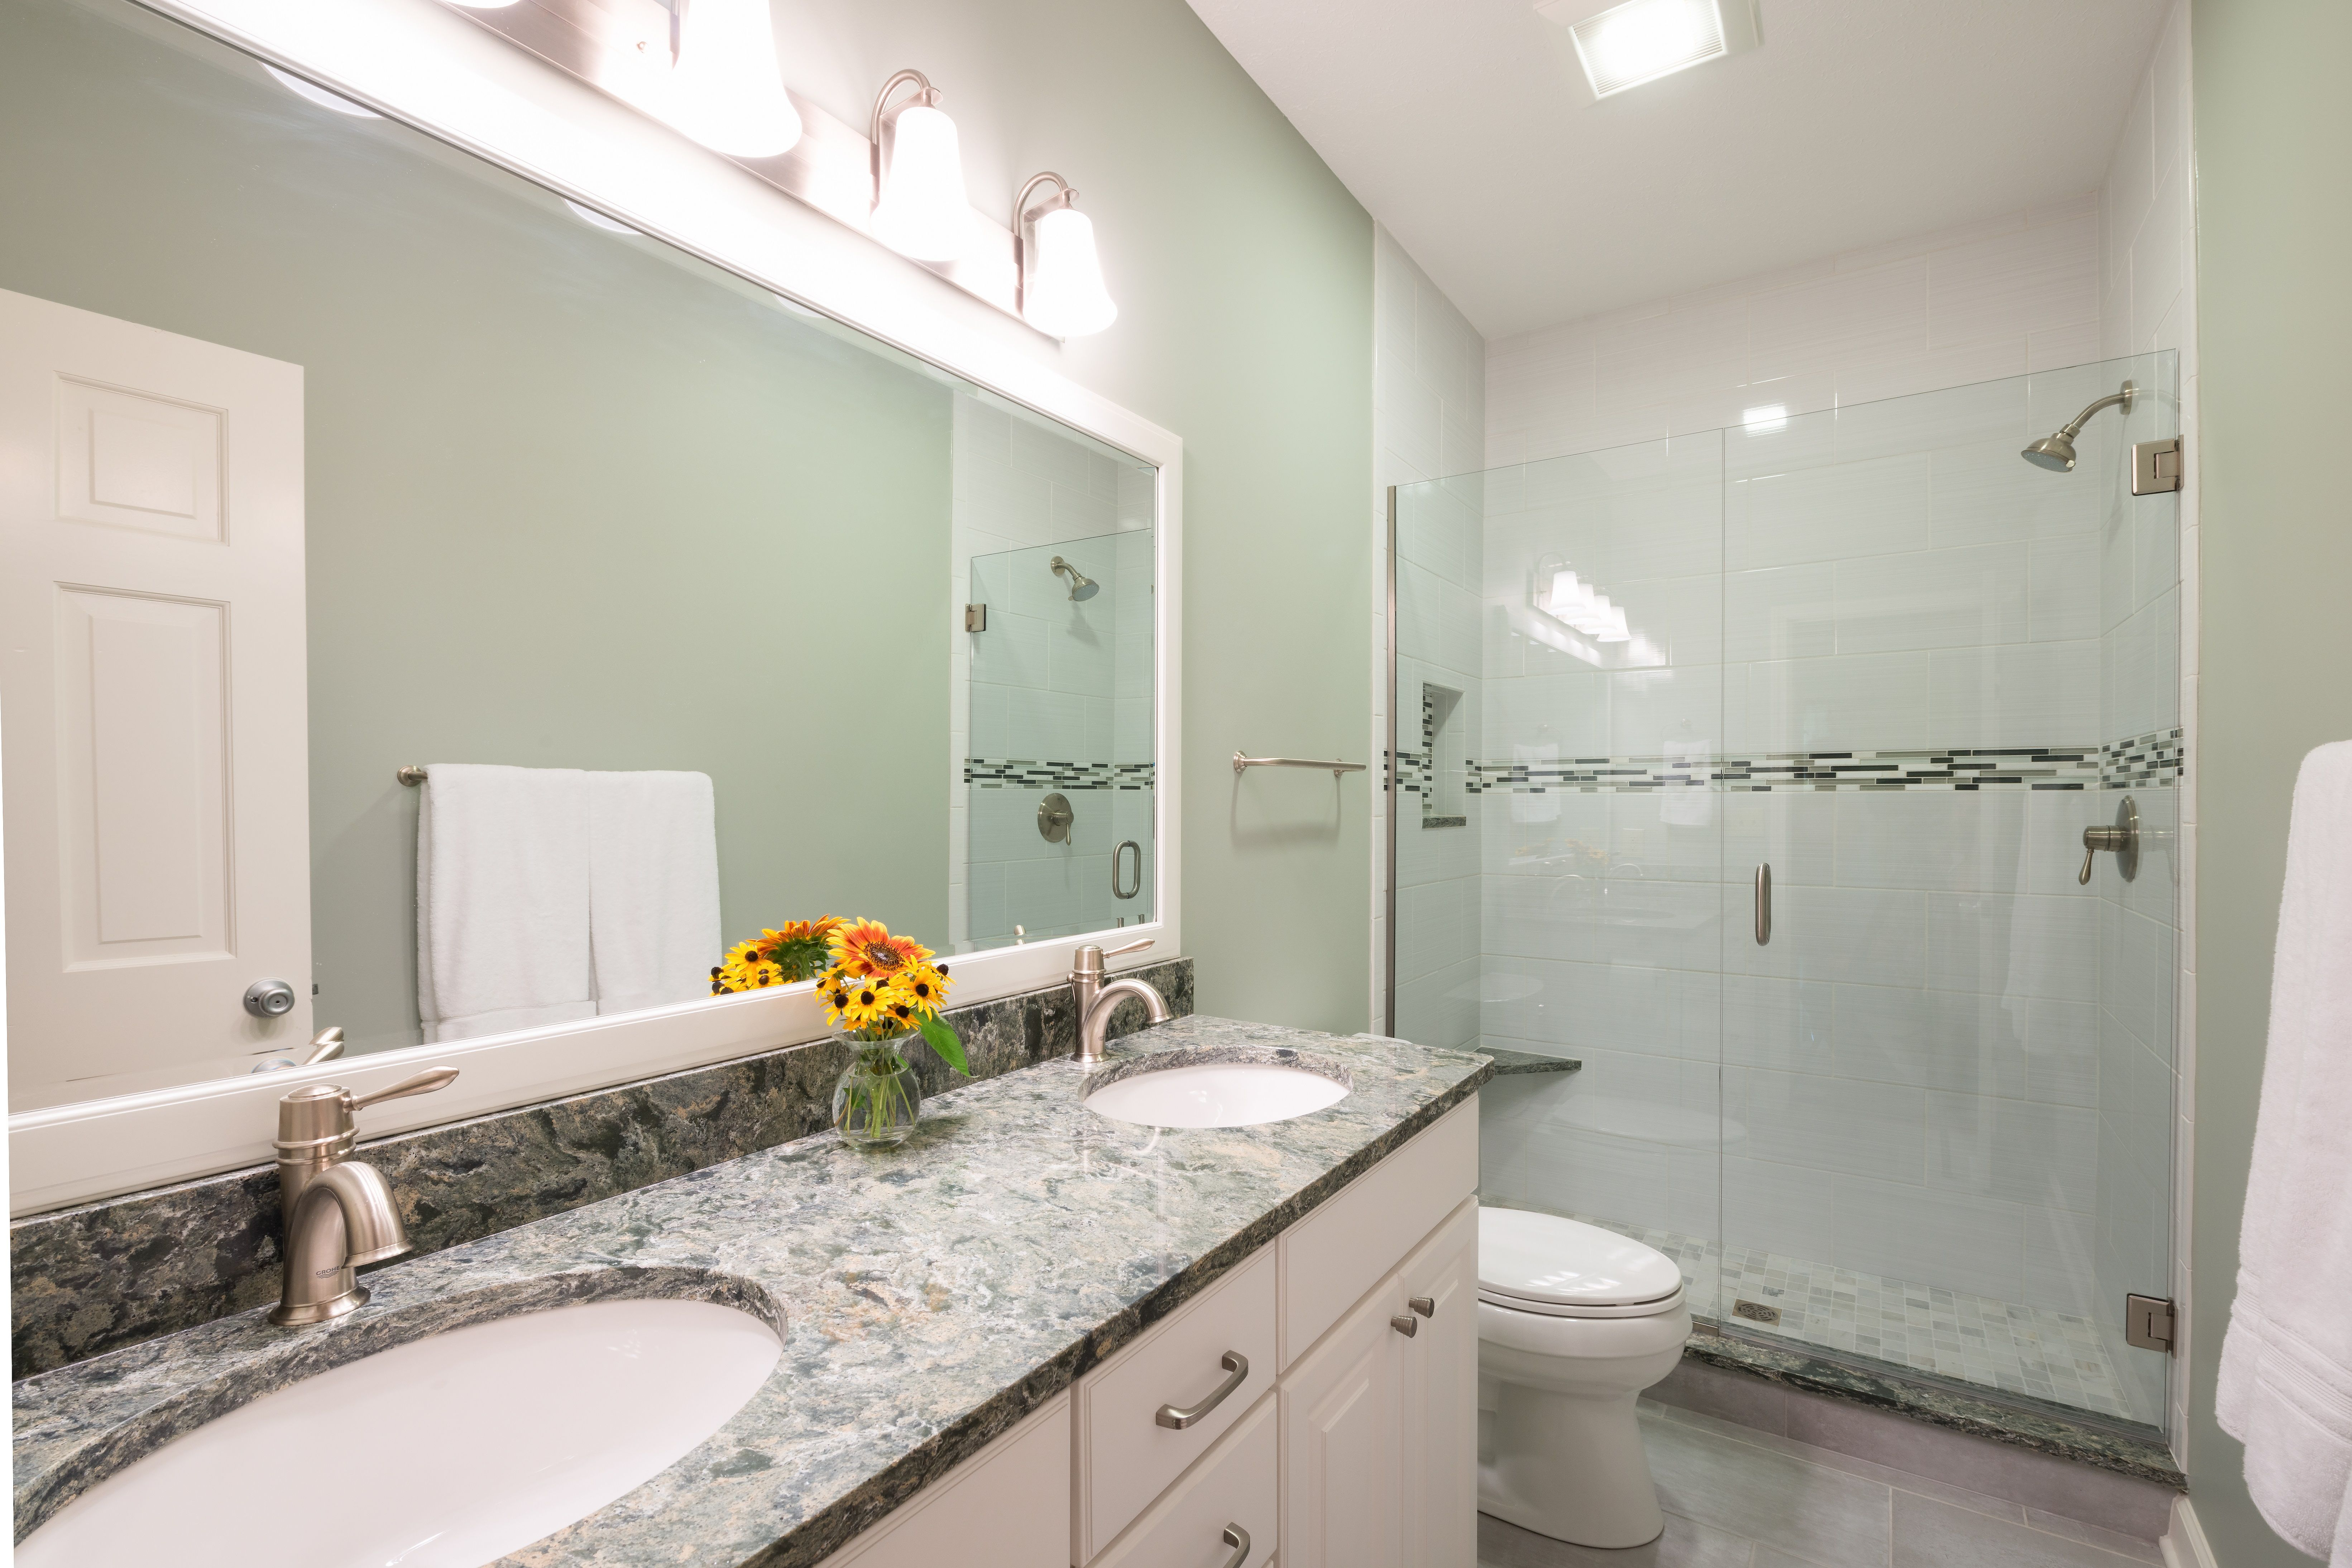 Guest bathroom remodel in Indiana. Quartz counter tops, walk in ...